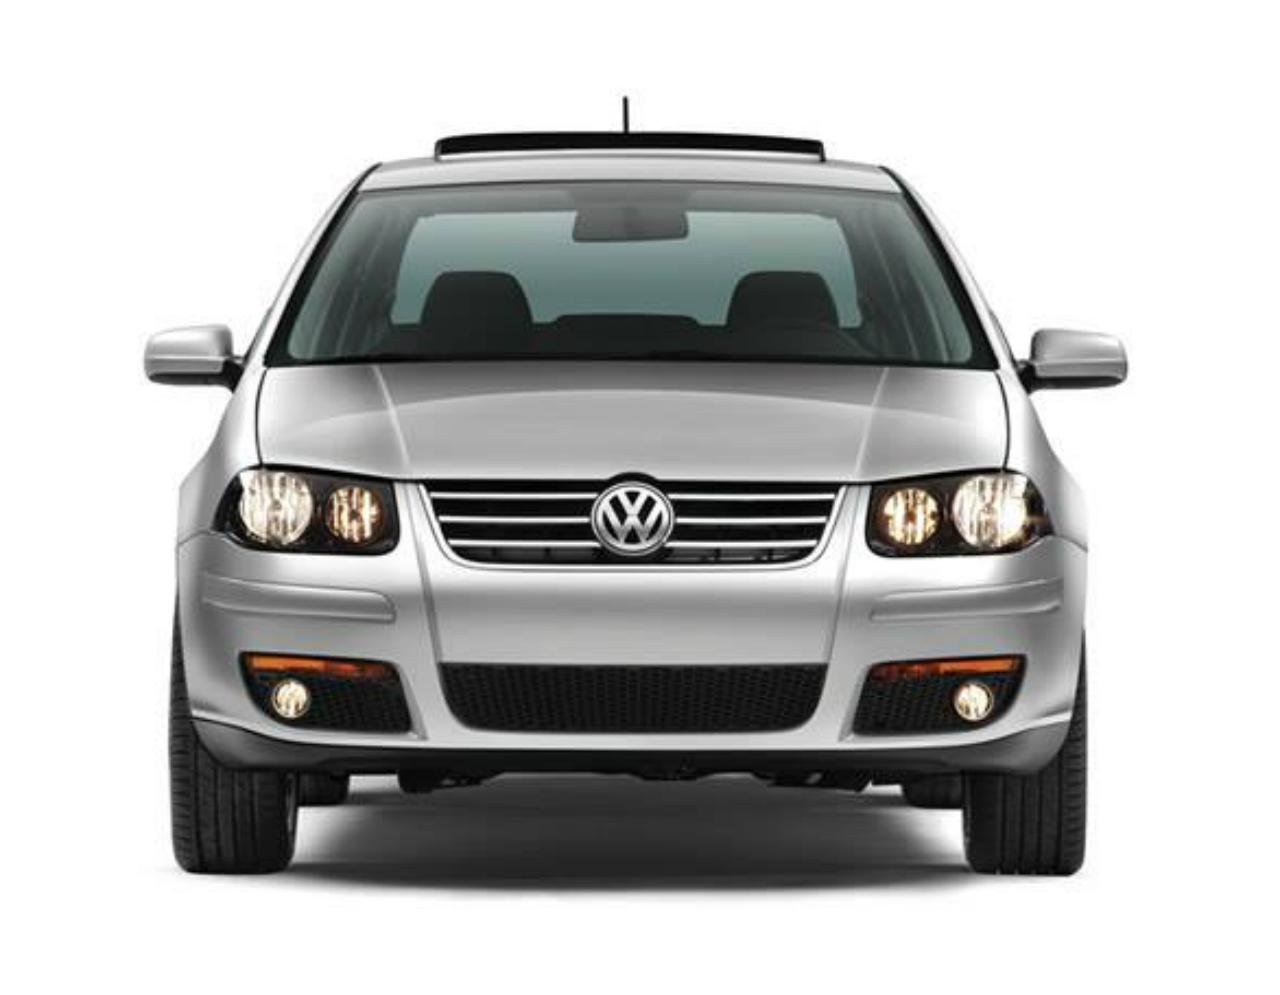 Volkswagen Clasico 2013 Catalogo | Atraccion360